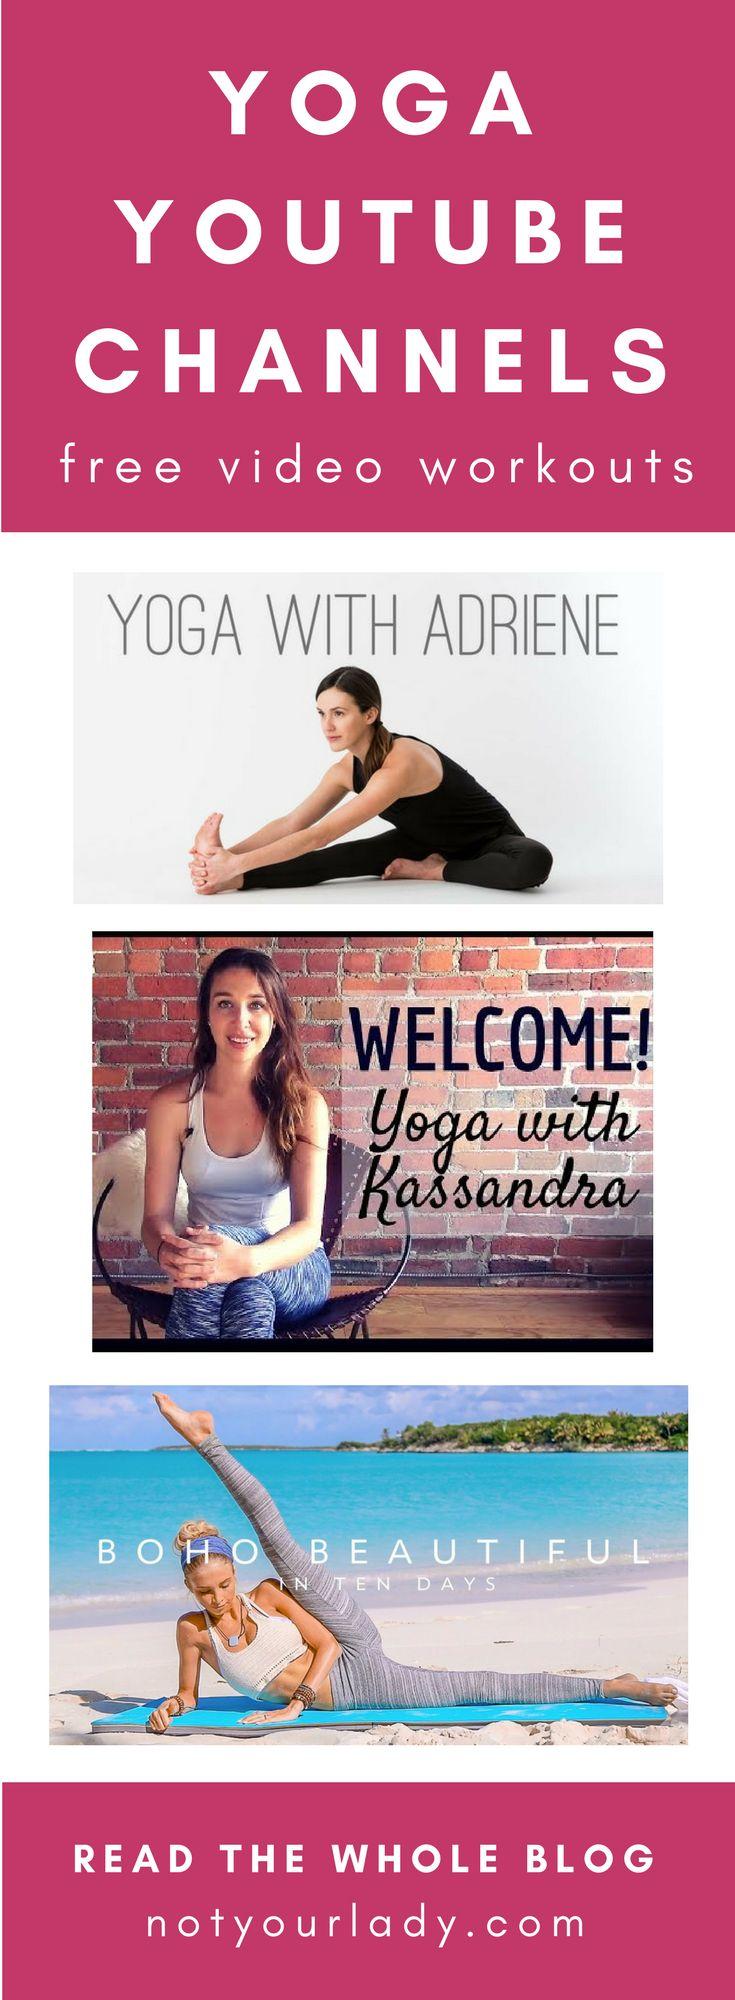 yoga youtube channels | Amazing yoga youtube channels to fuel your yoga practice...